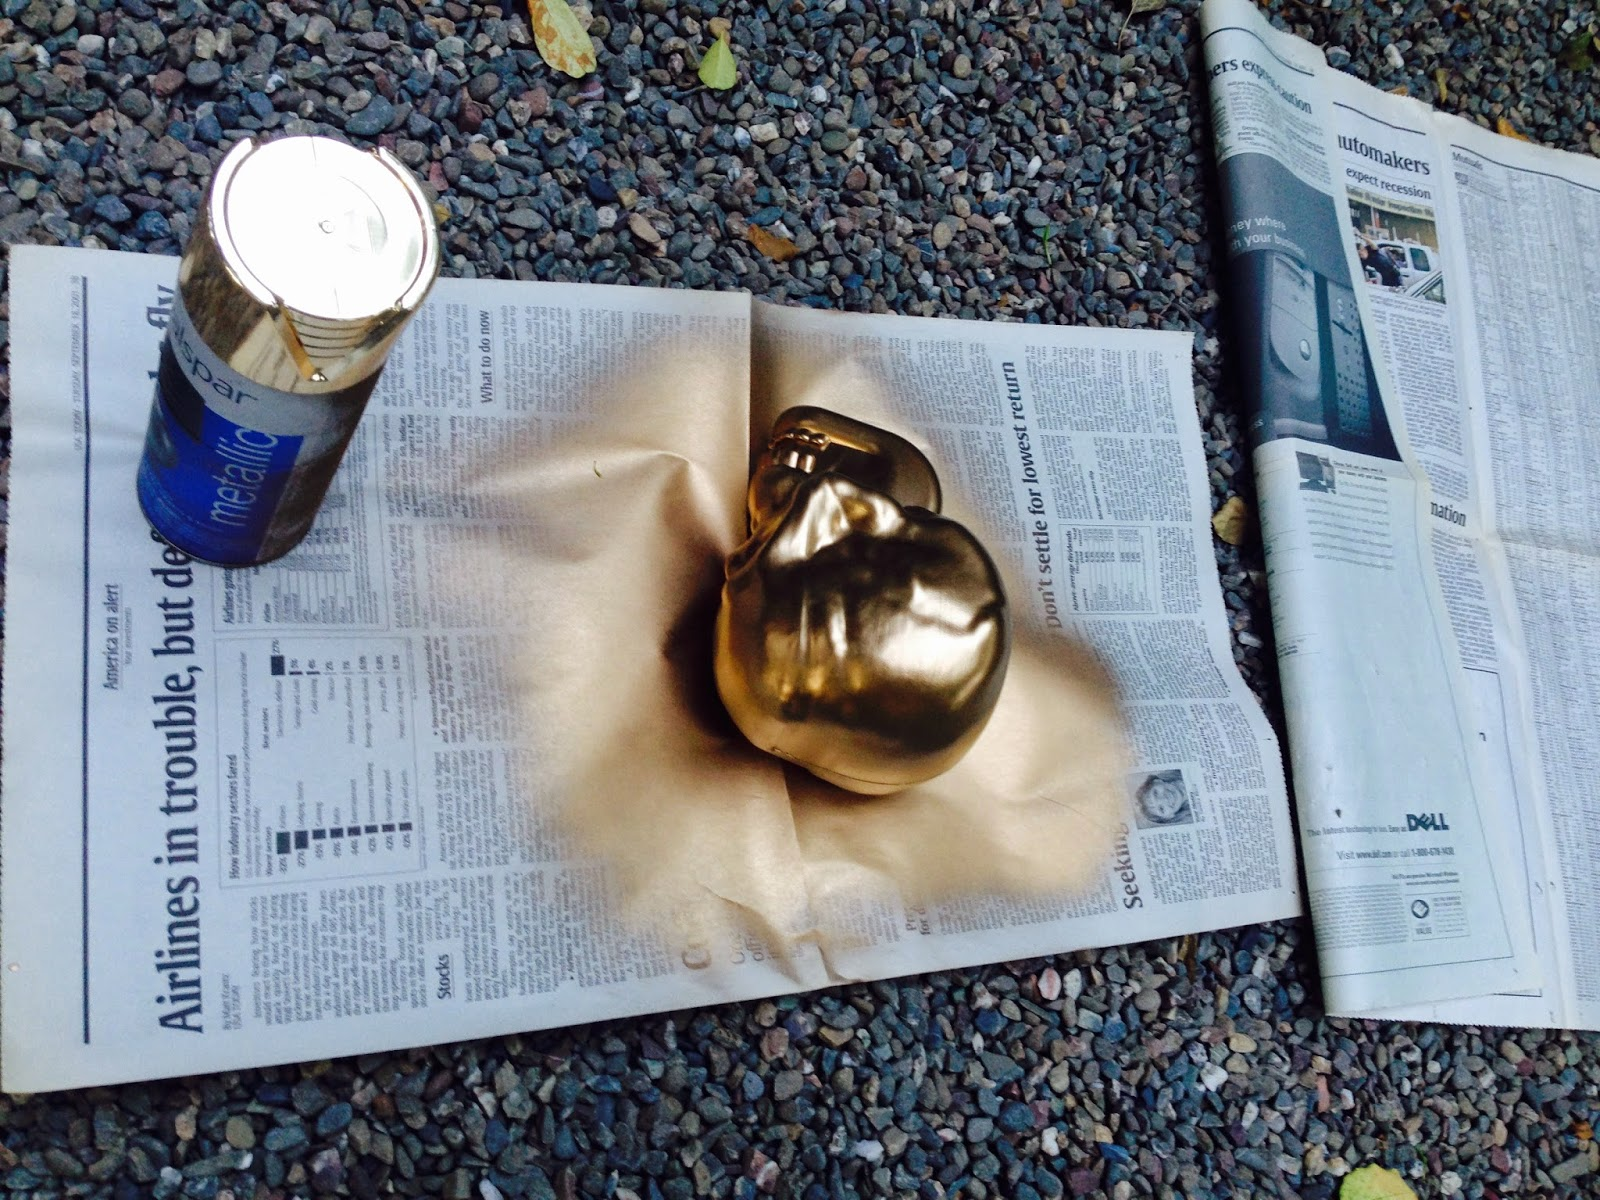 Diy skull bookend www.savvysydney.com #skull #gold #halloween #fun #diy #painting #bookend #craft #present #gift